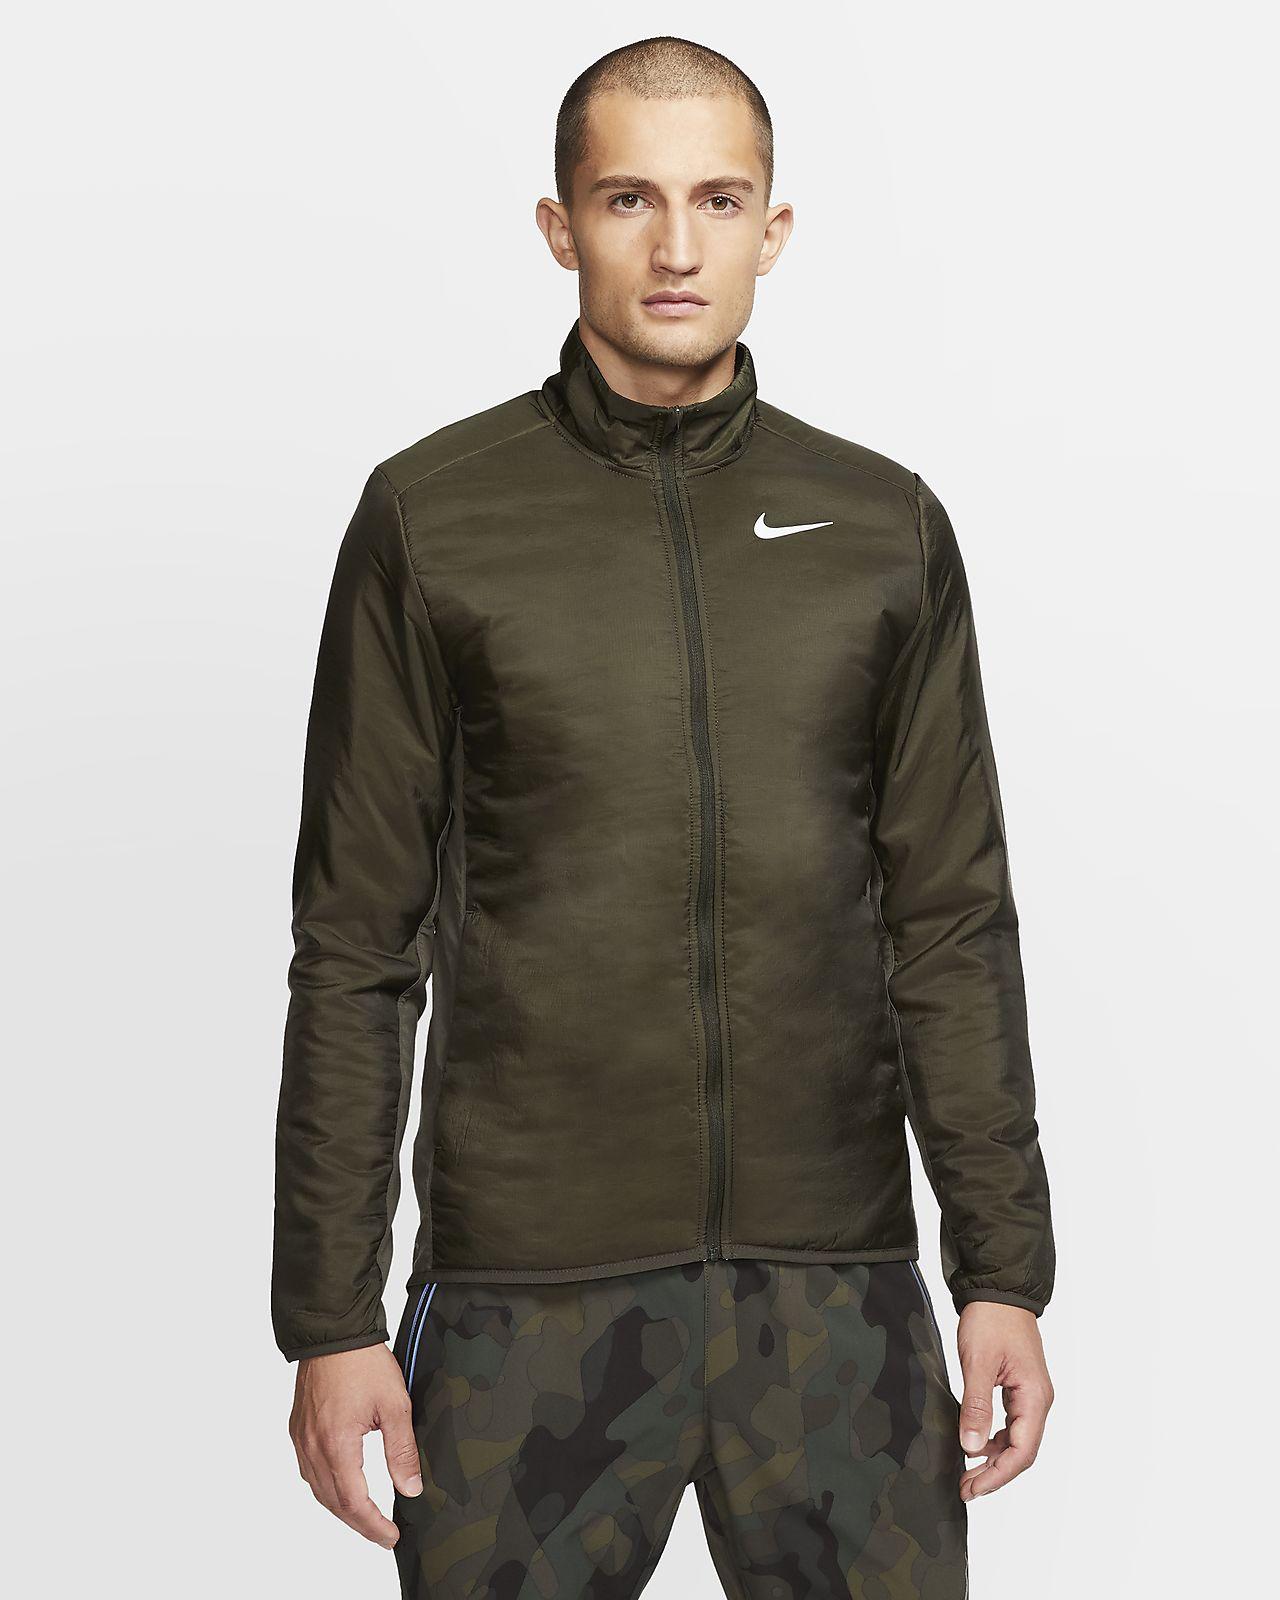 sopa Premedicación Provisional  Nike AeroLayer Men's Running Jacket. Nike CA